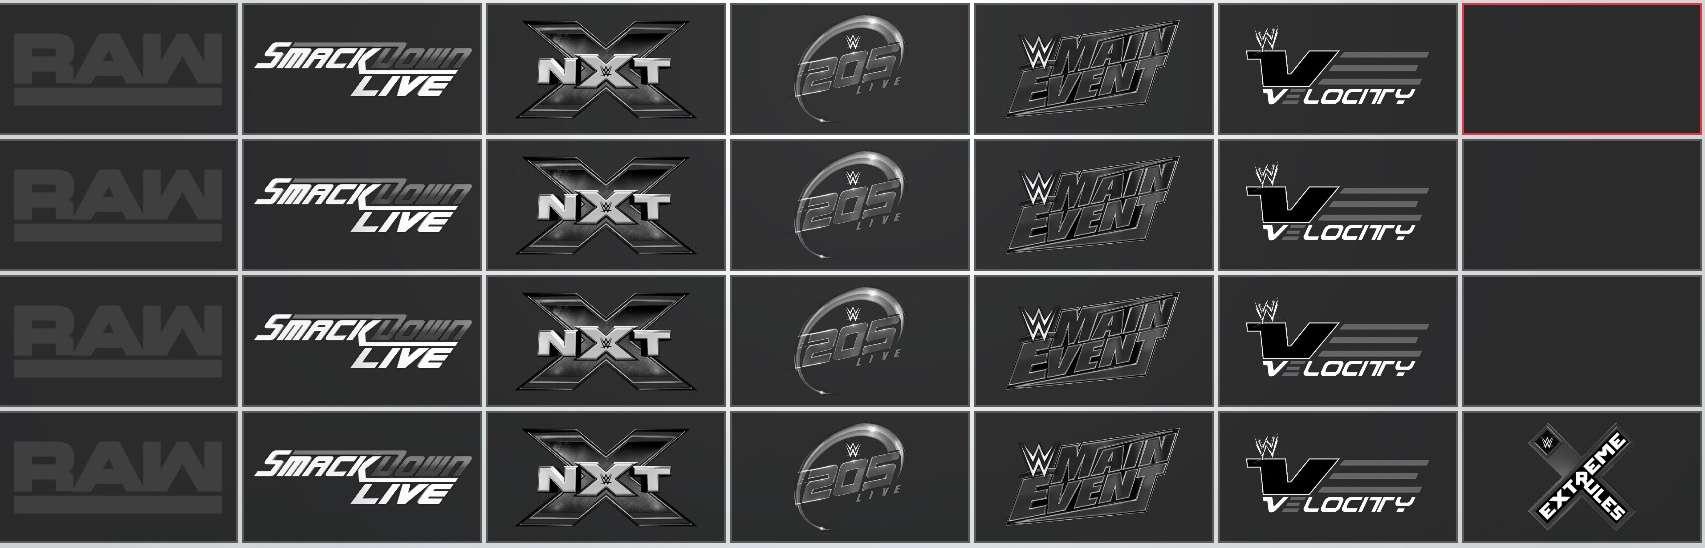 X9vrRb.jpg